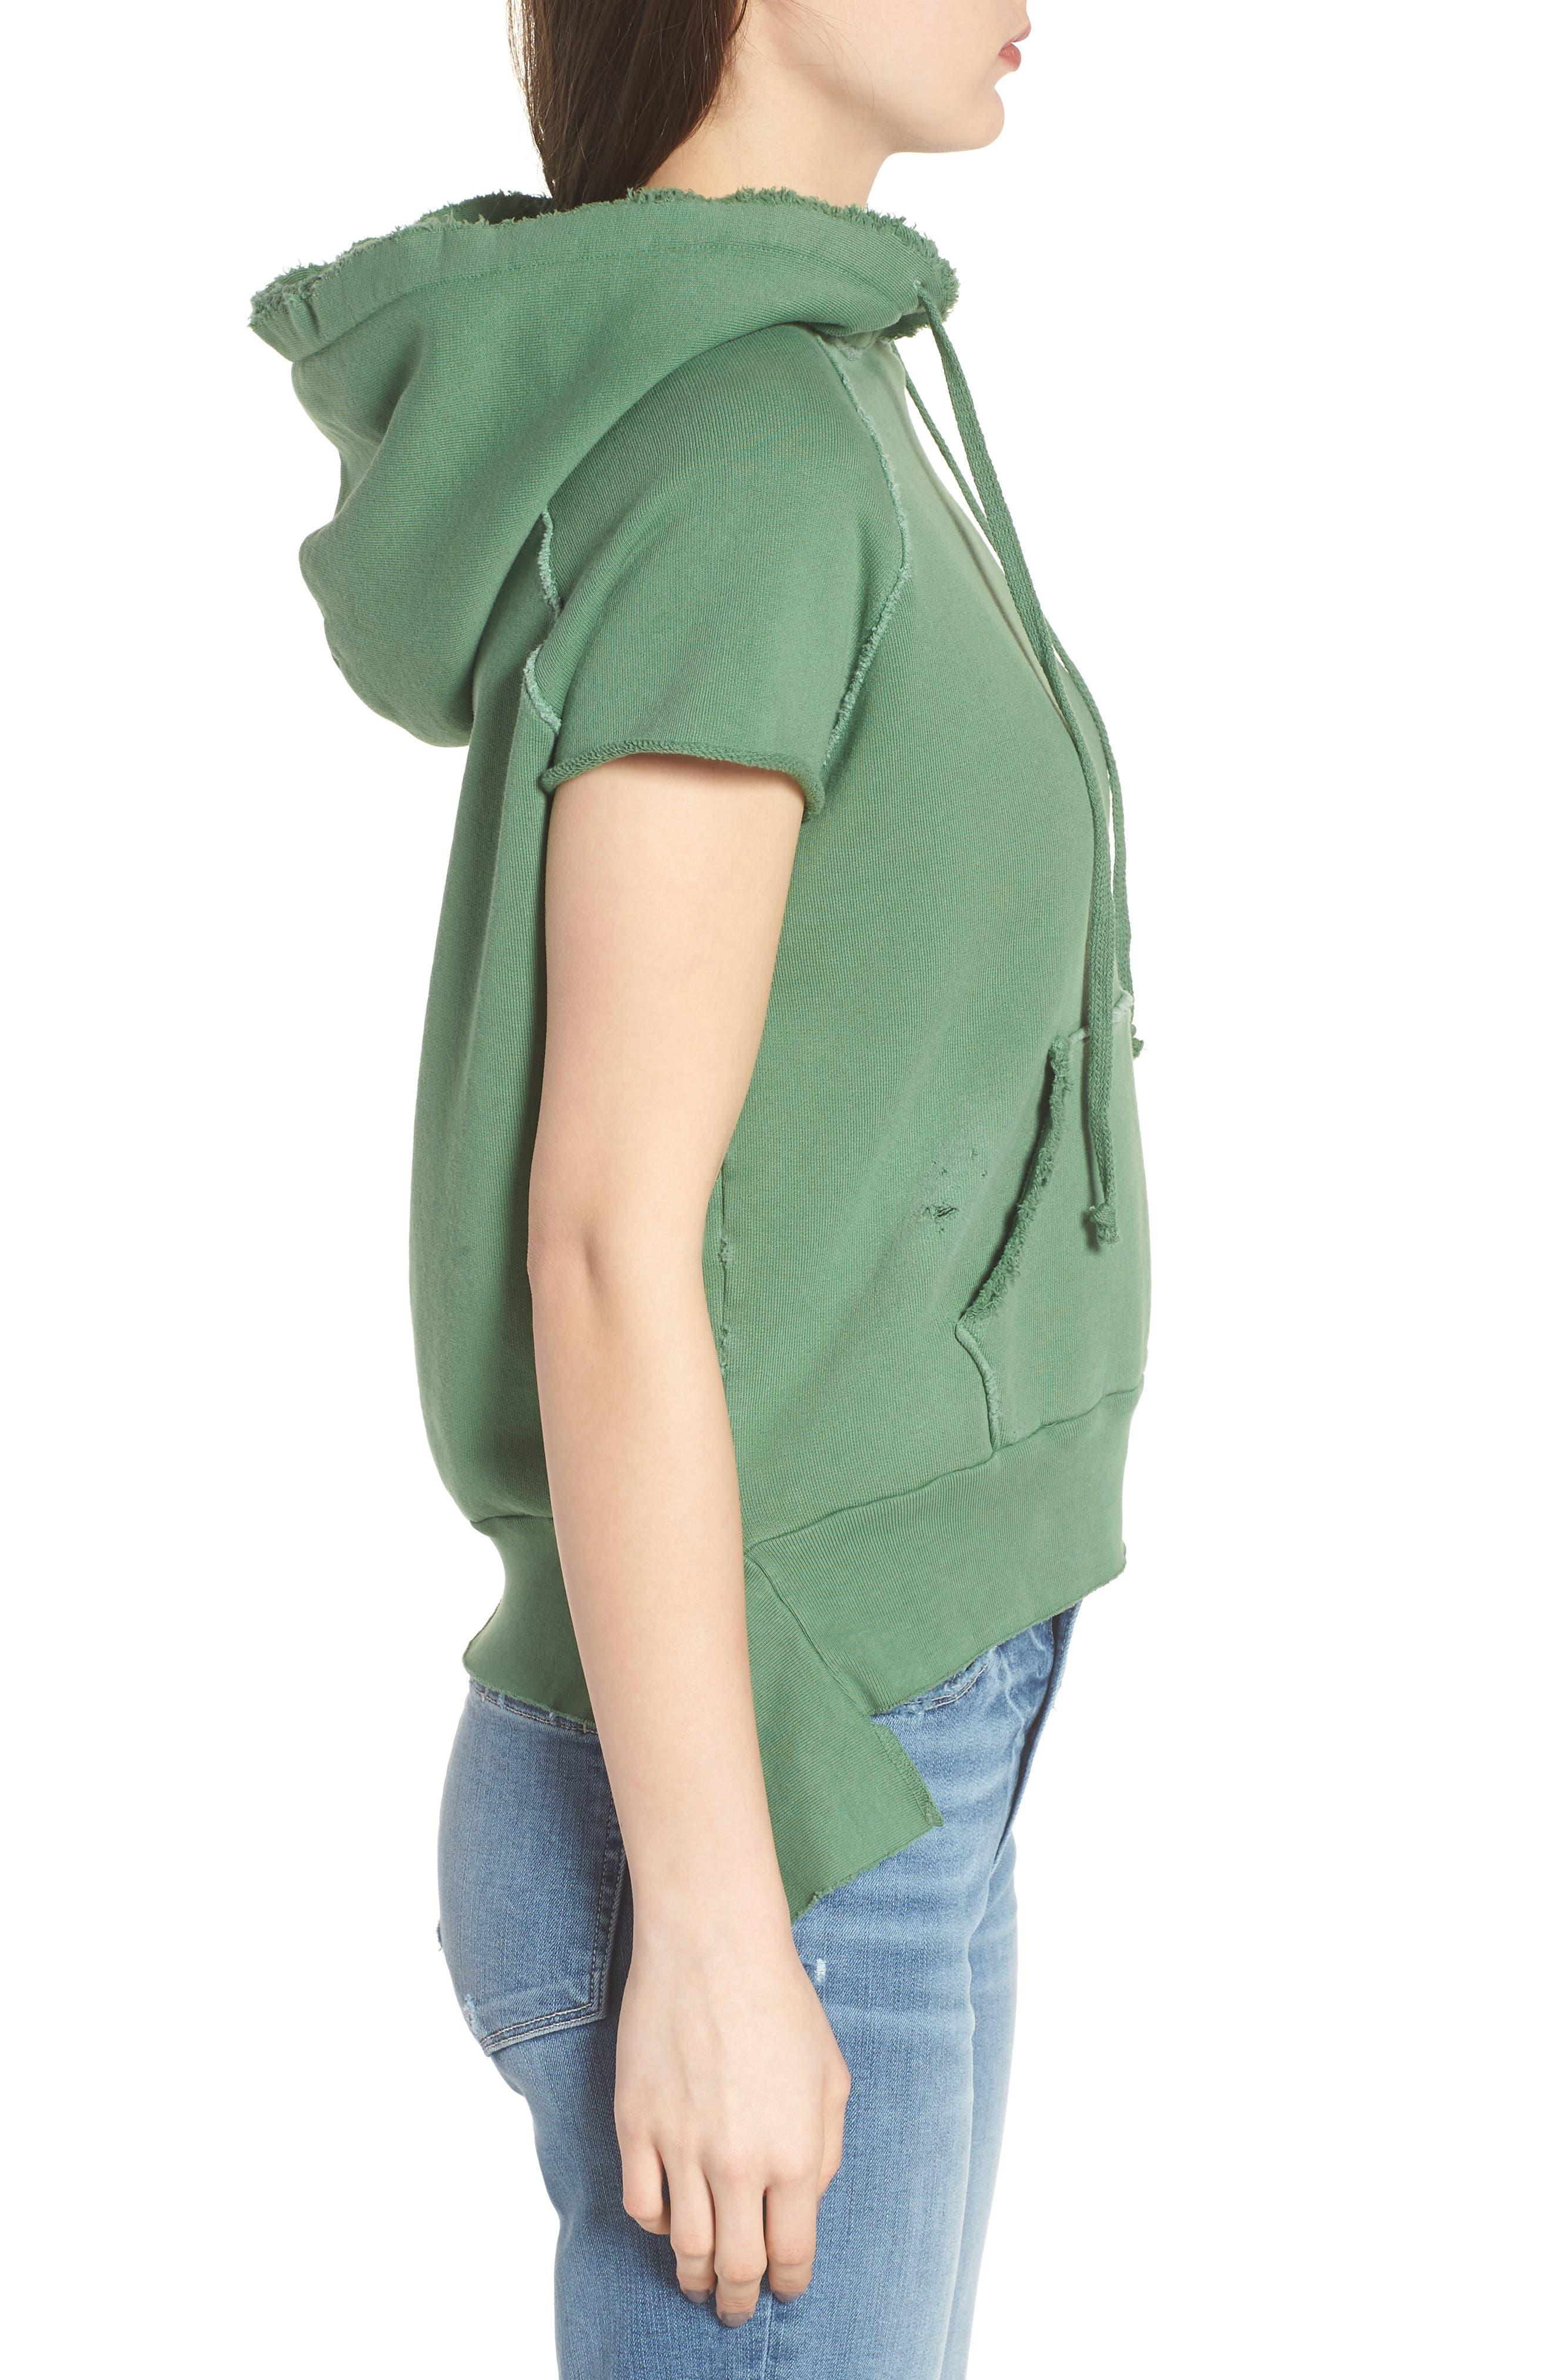 Short Sleeve Pullover Hoodie,                             Alternate thumbnail 3, color,                             Envied 5 Year Vintage Wash